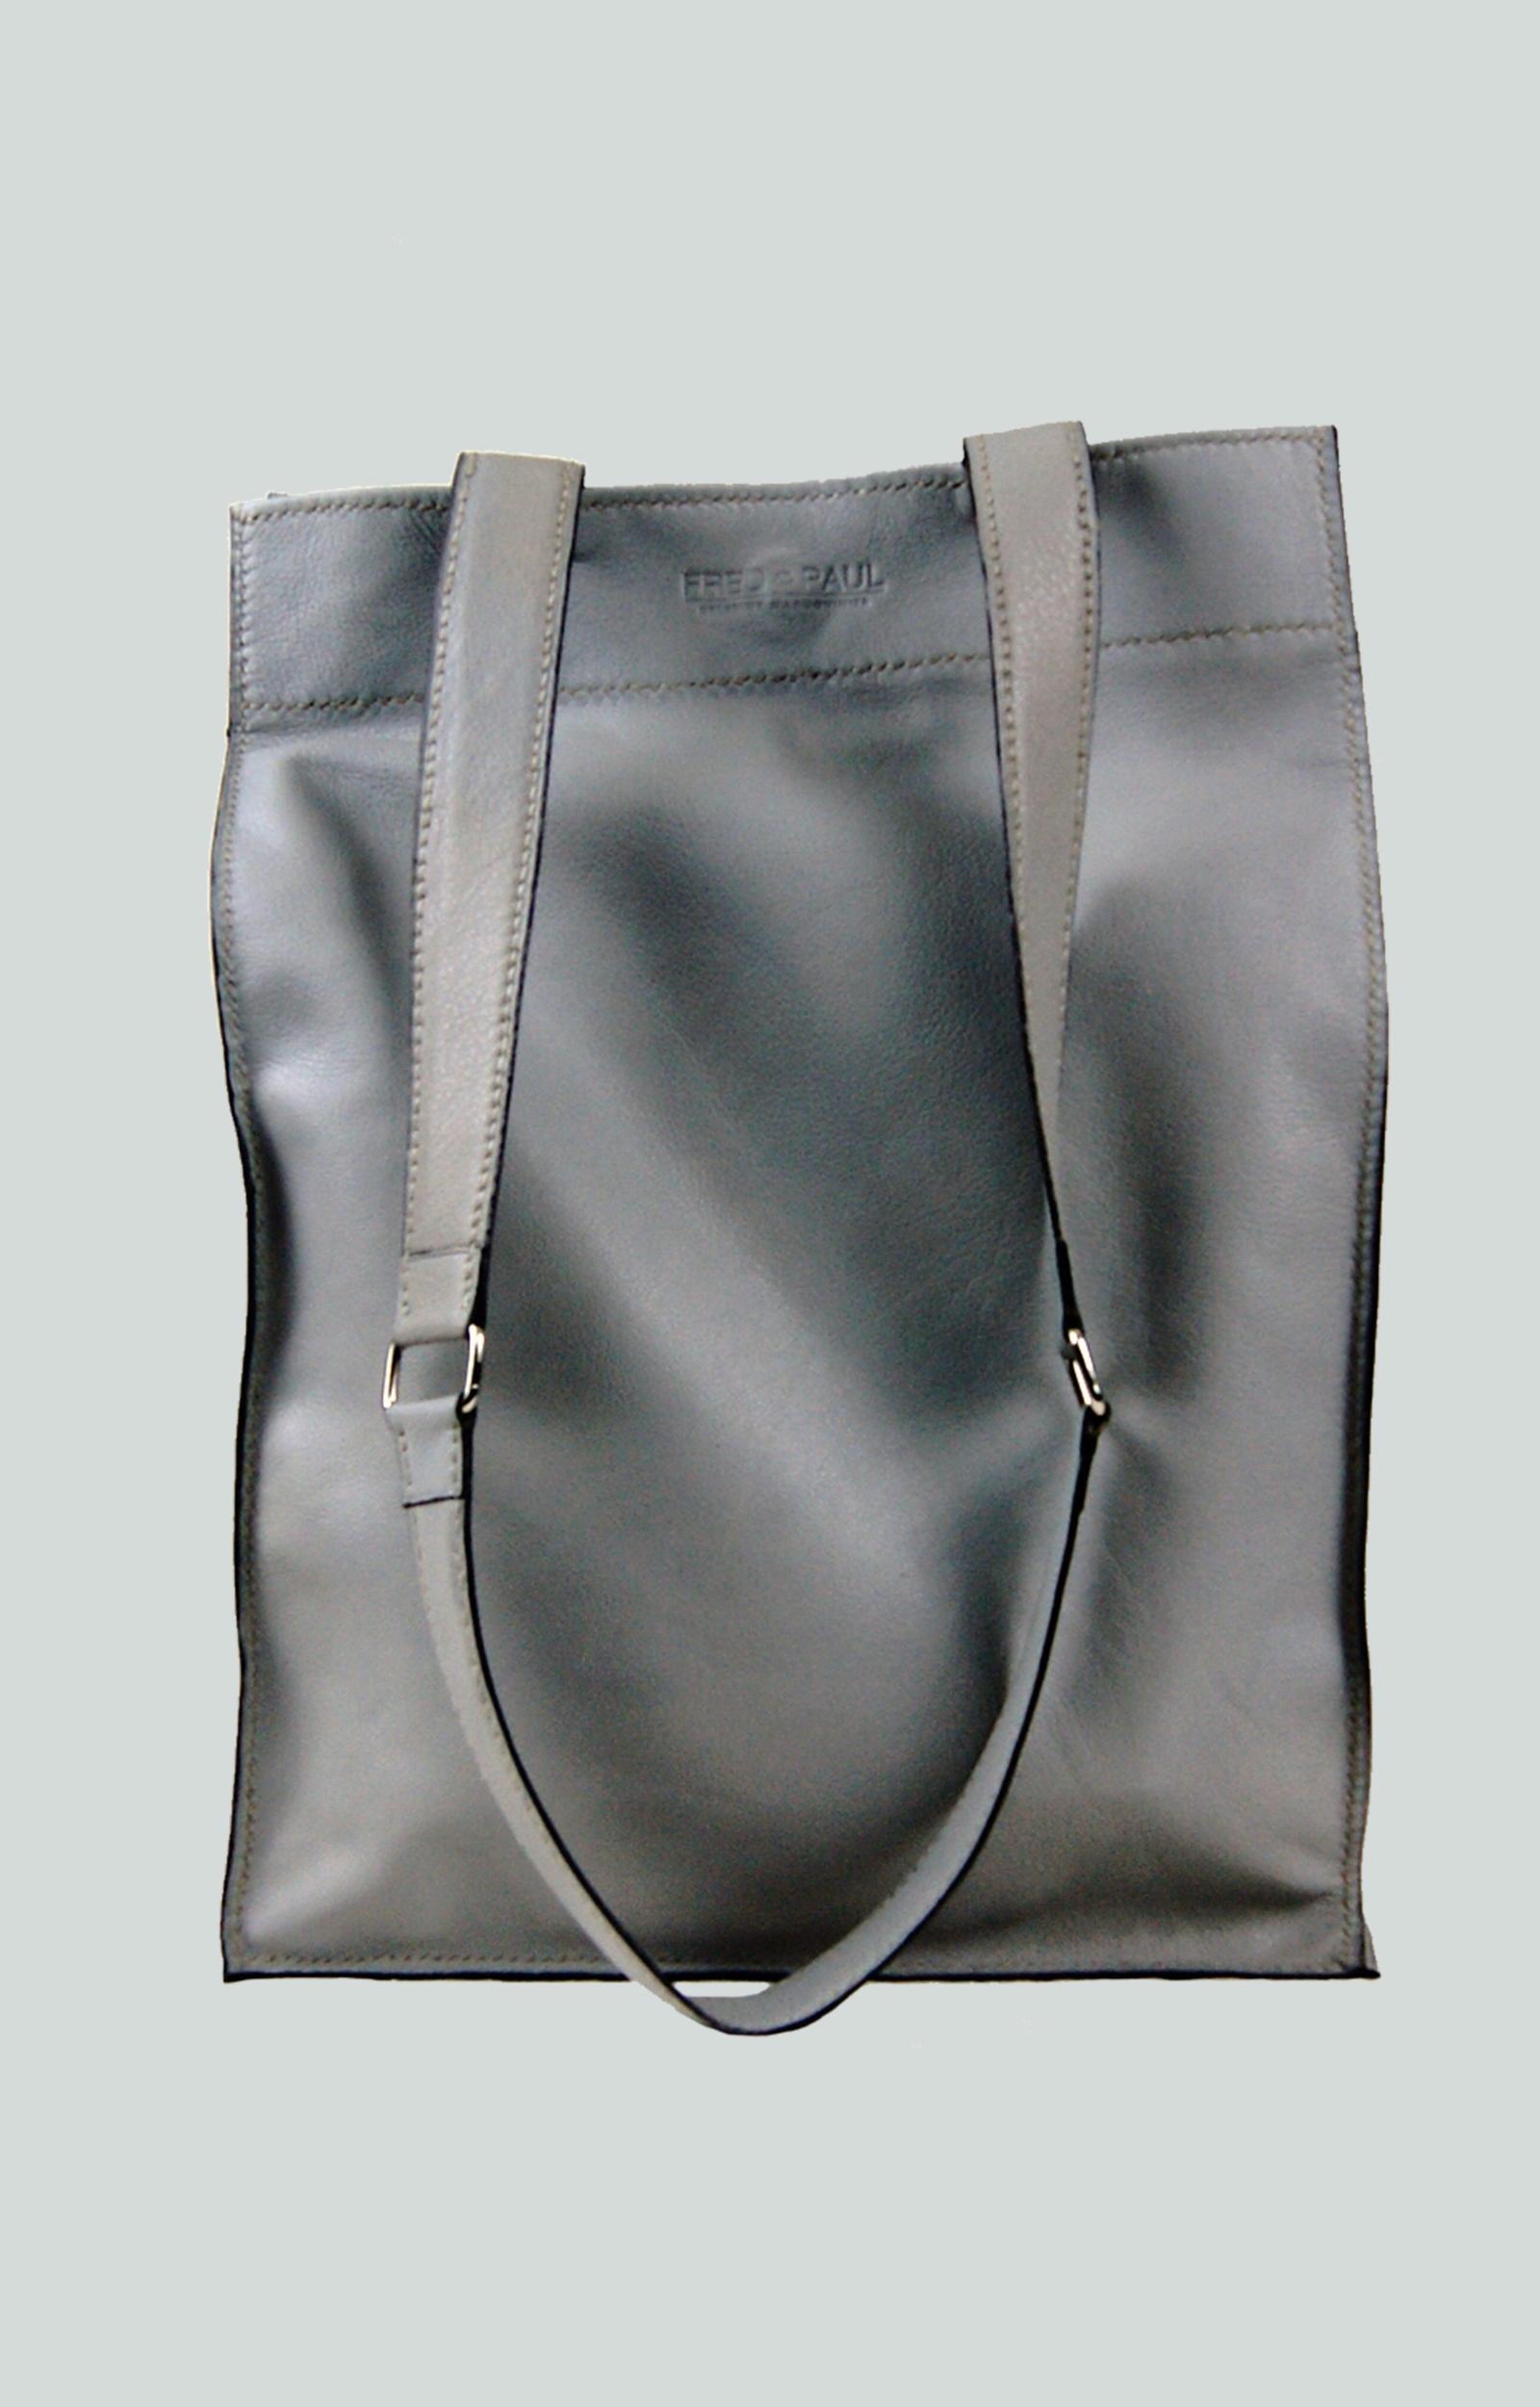 KAMET 2.0 sac shopping en cuir de veau gris